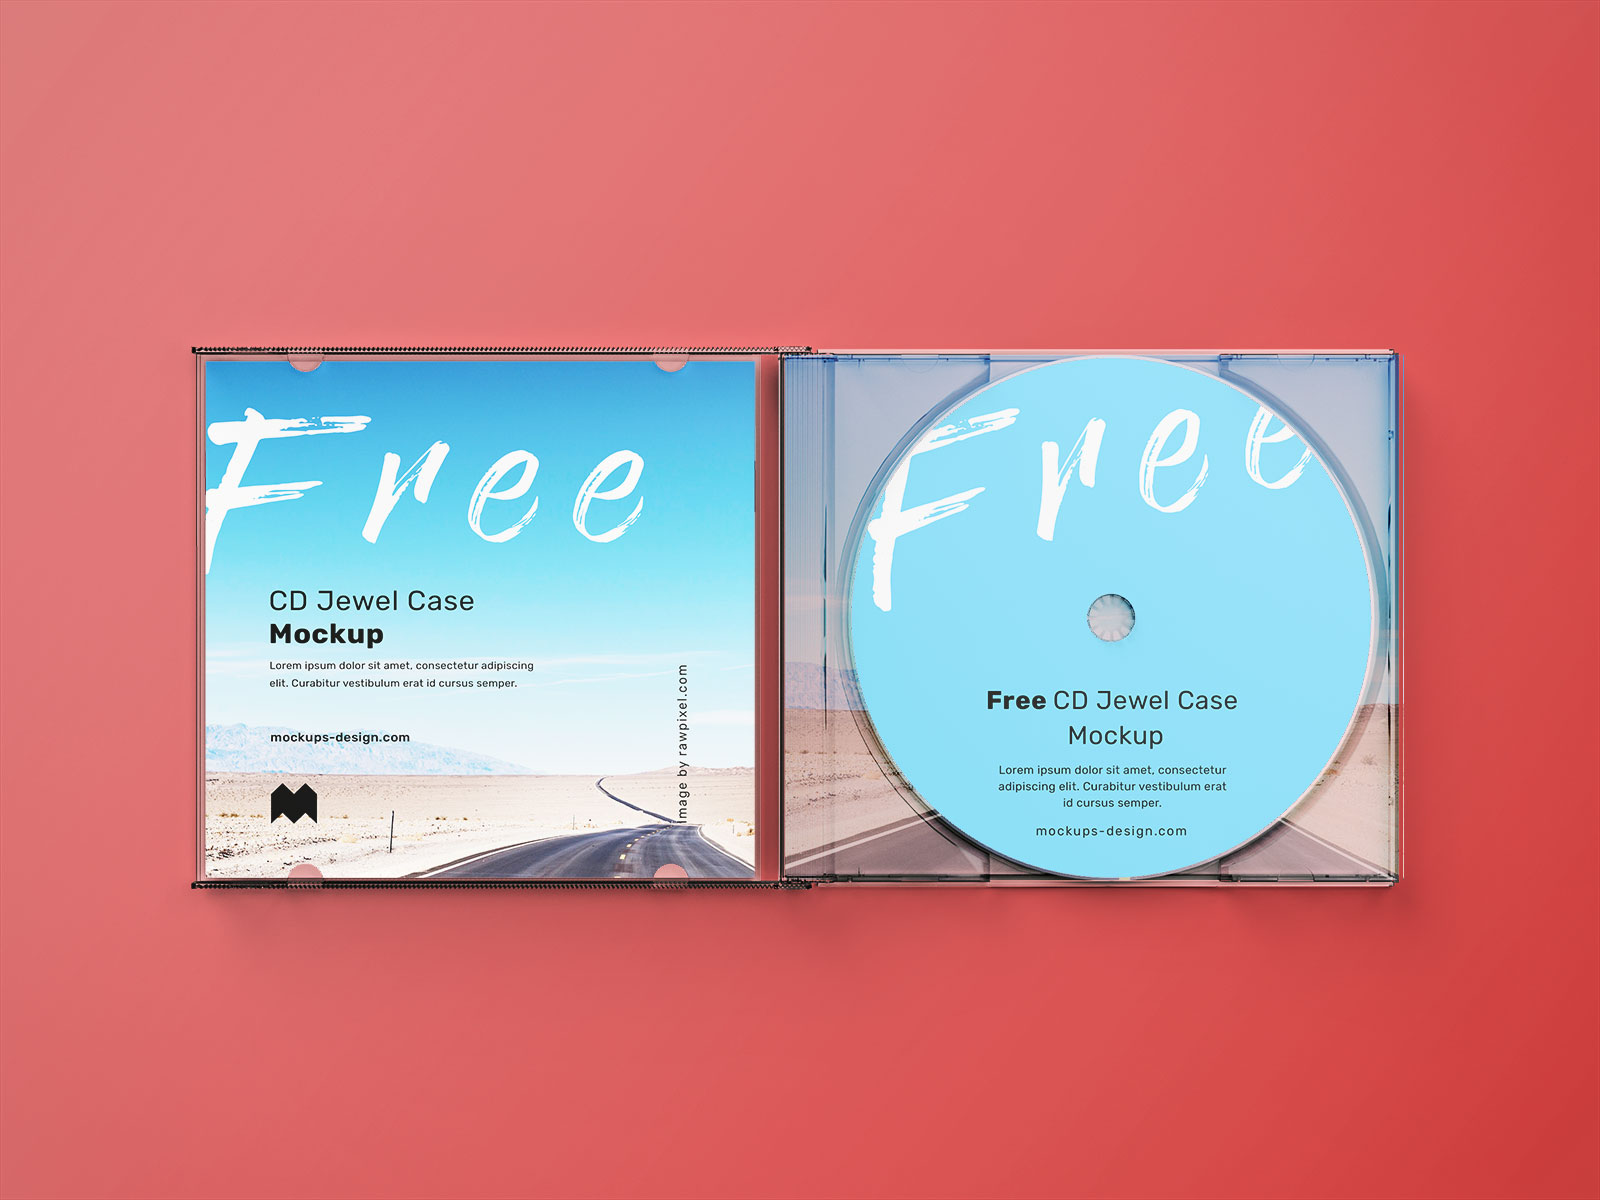 Free Plastic CD Disc Jewel Case Mockup PSD Set